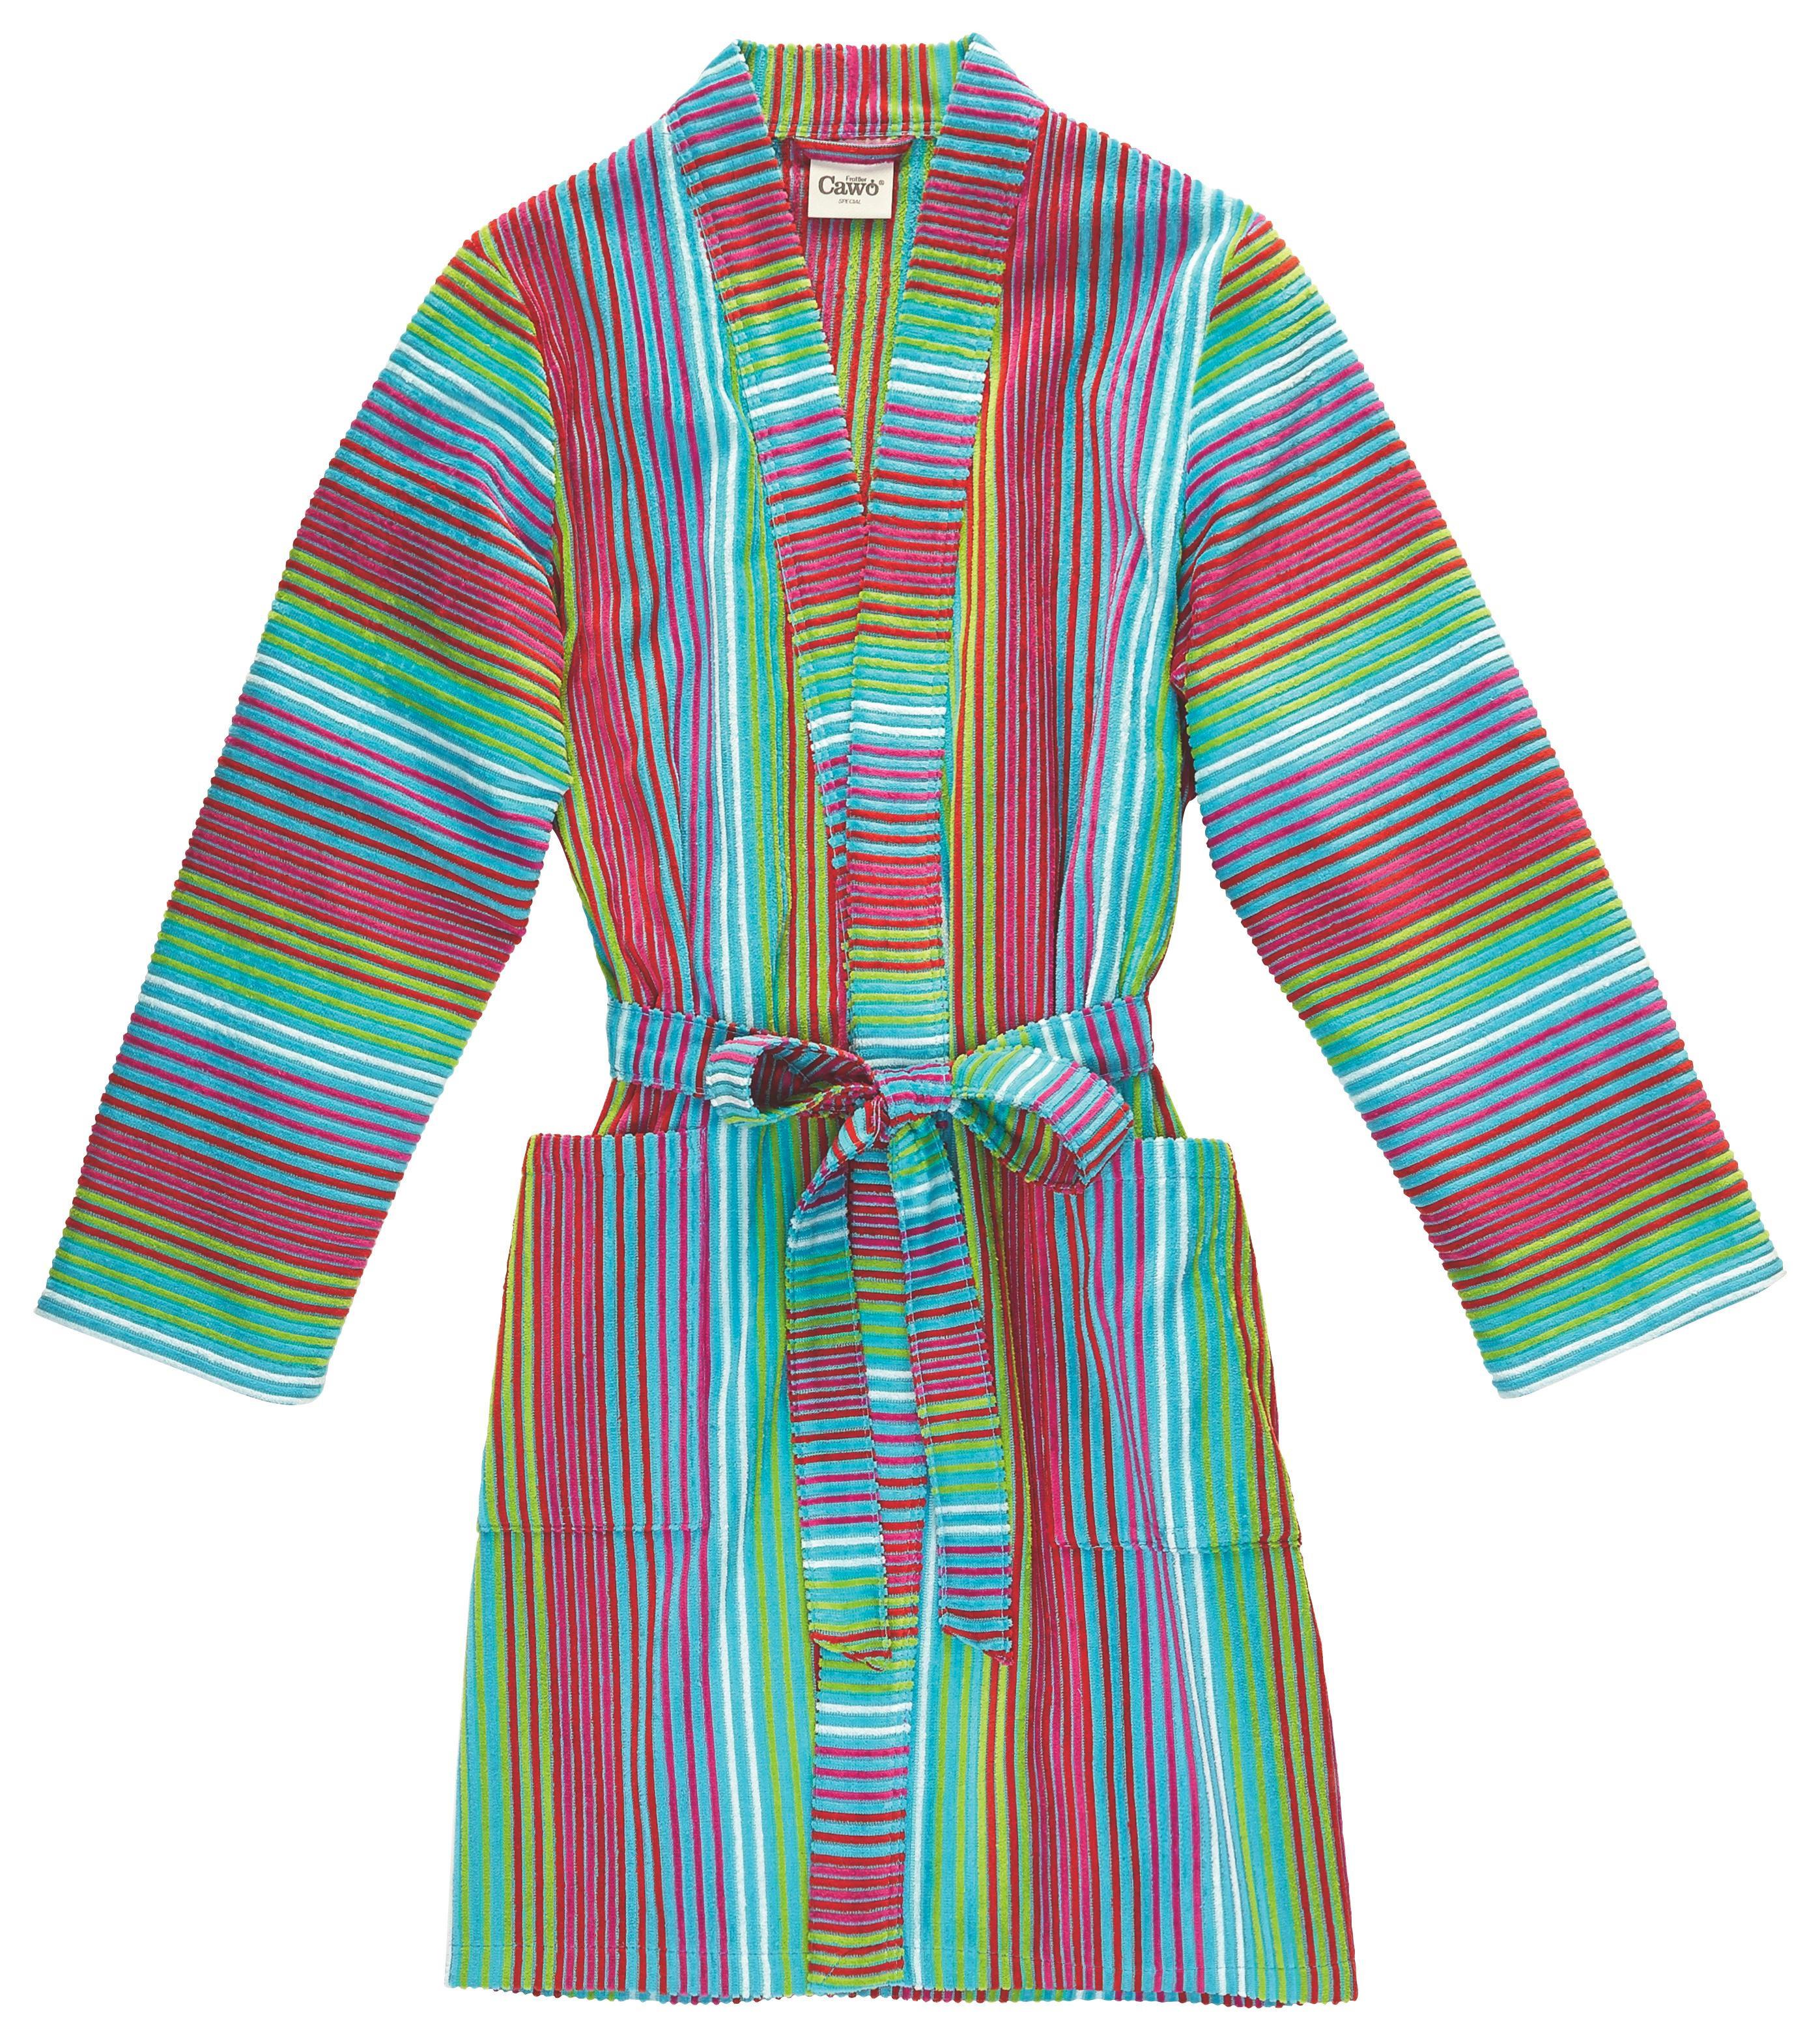 BADEMANTEL  Multicolor - Multicolor, Basics, Textil (44/46) - CAWOE